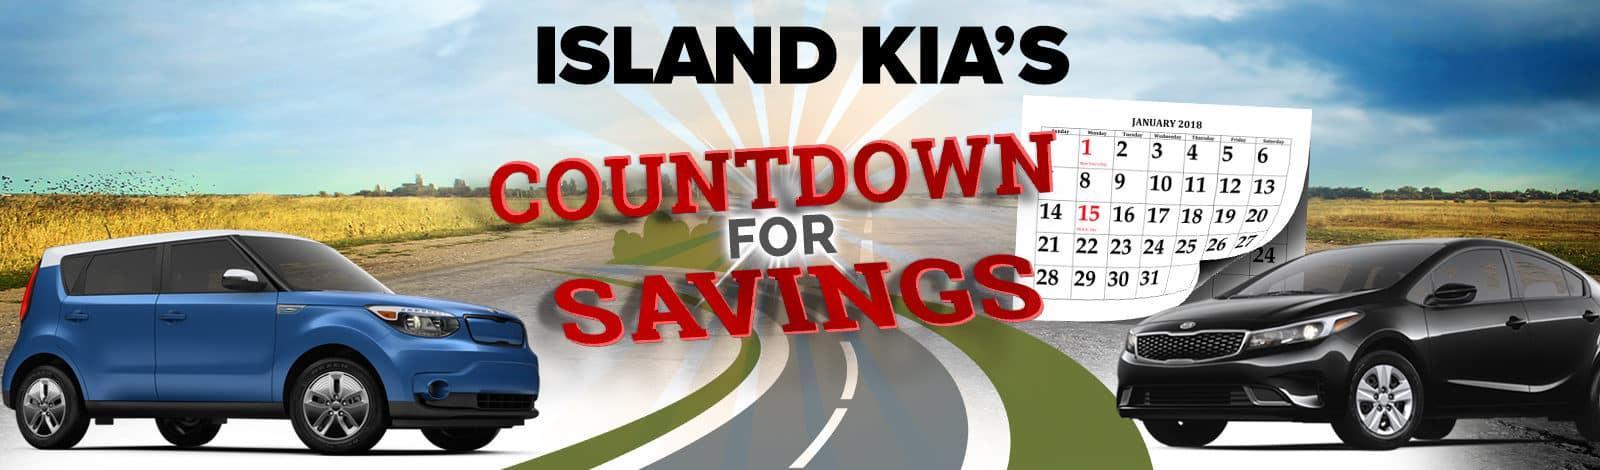 Island Kia Countdown Banner